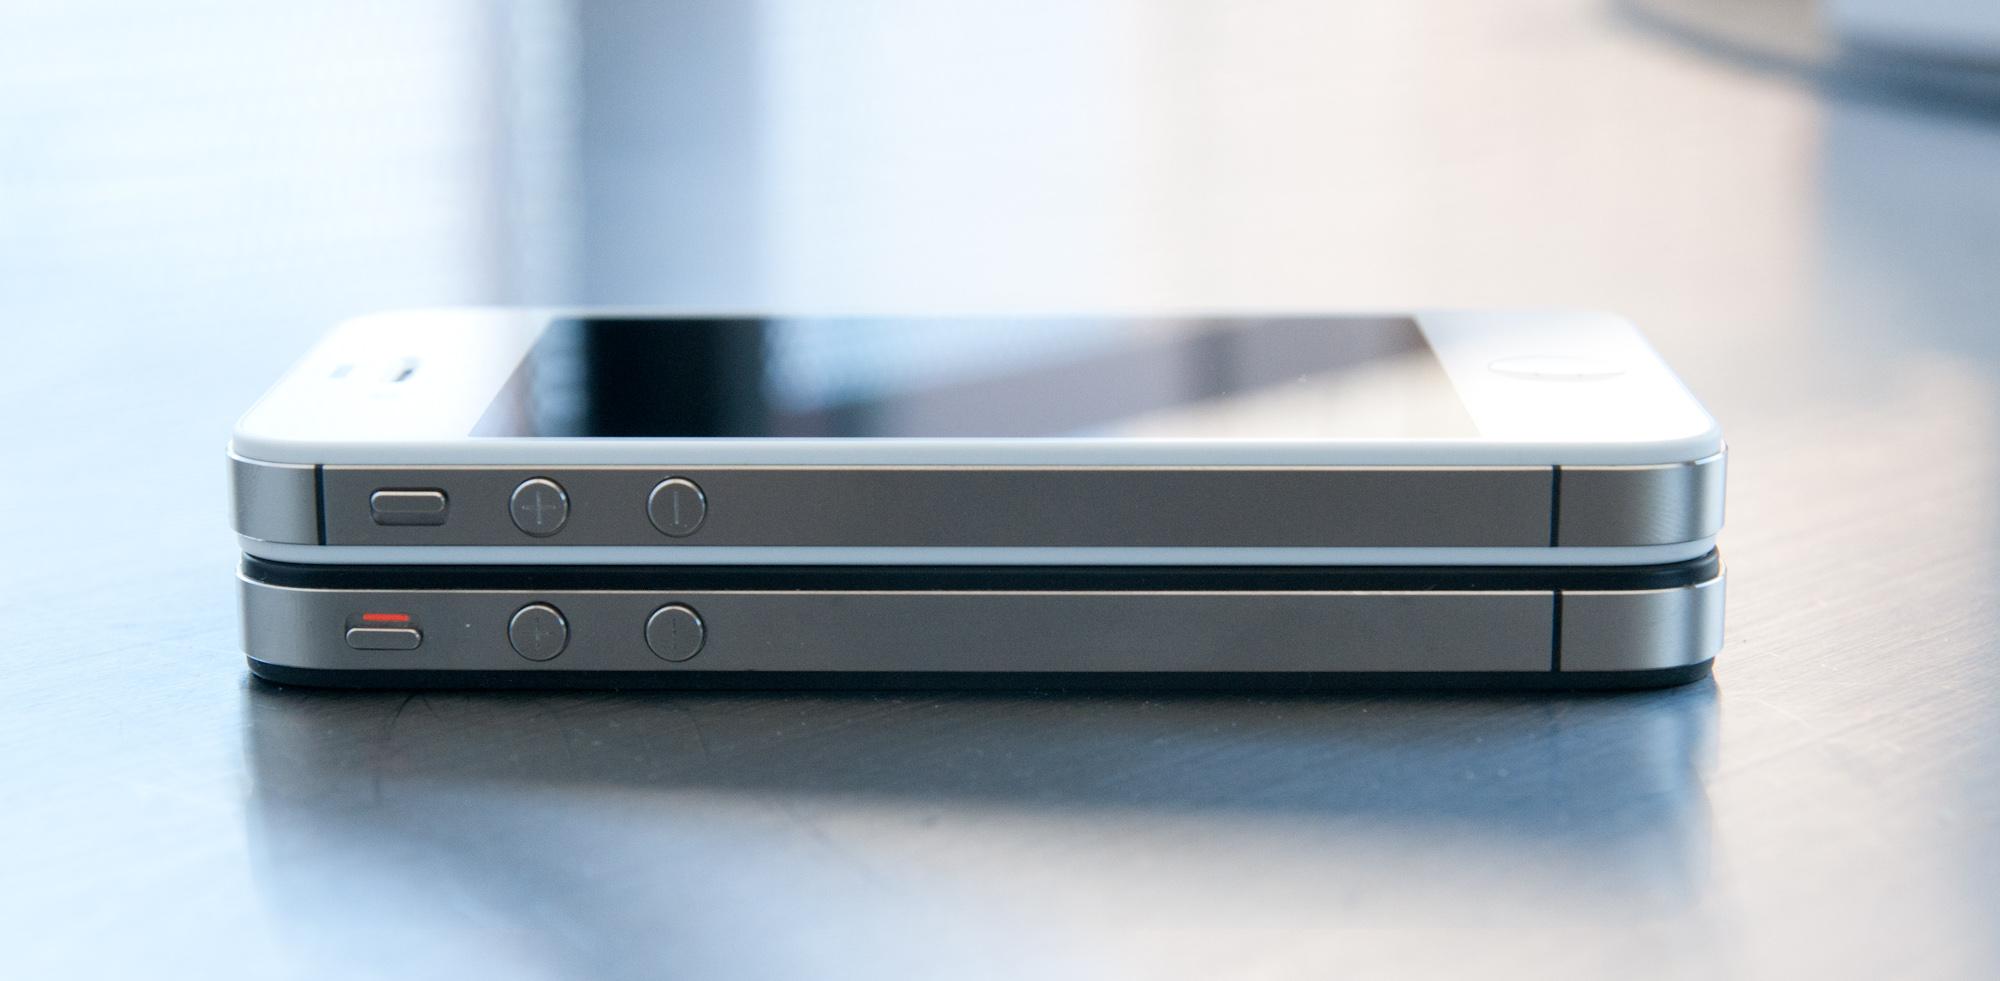 Manual Do Iphone 4g 32gb